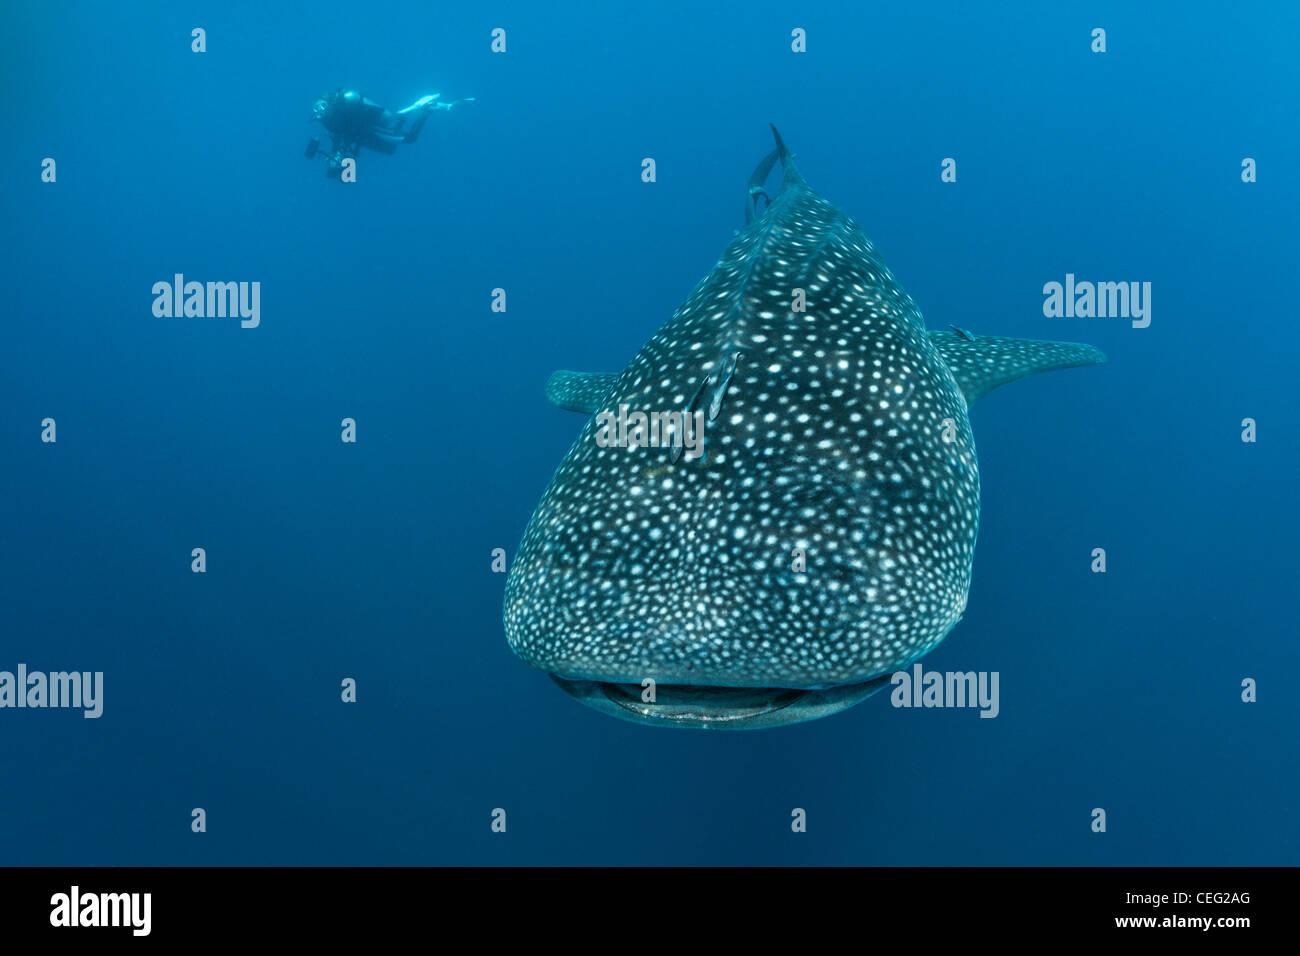 Whale Shark, Rhincodon typus, North Male Atoll, Indian Ocean, Maldives - Stock Image